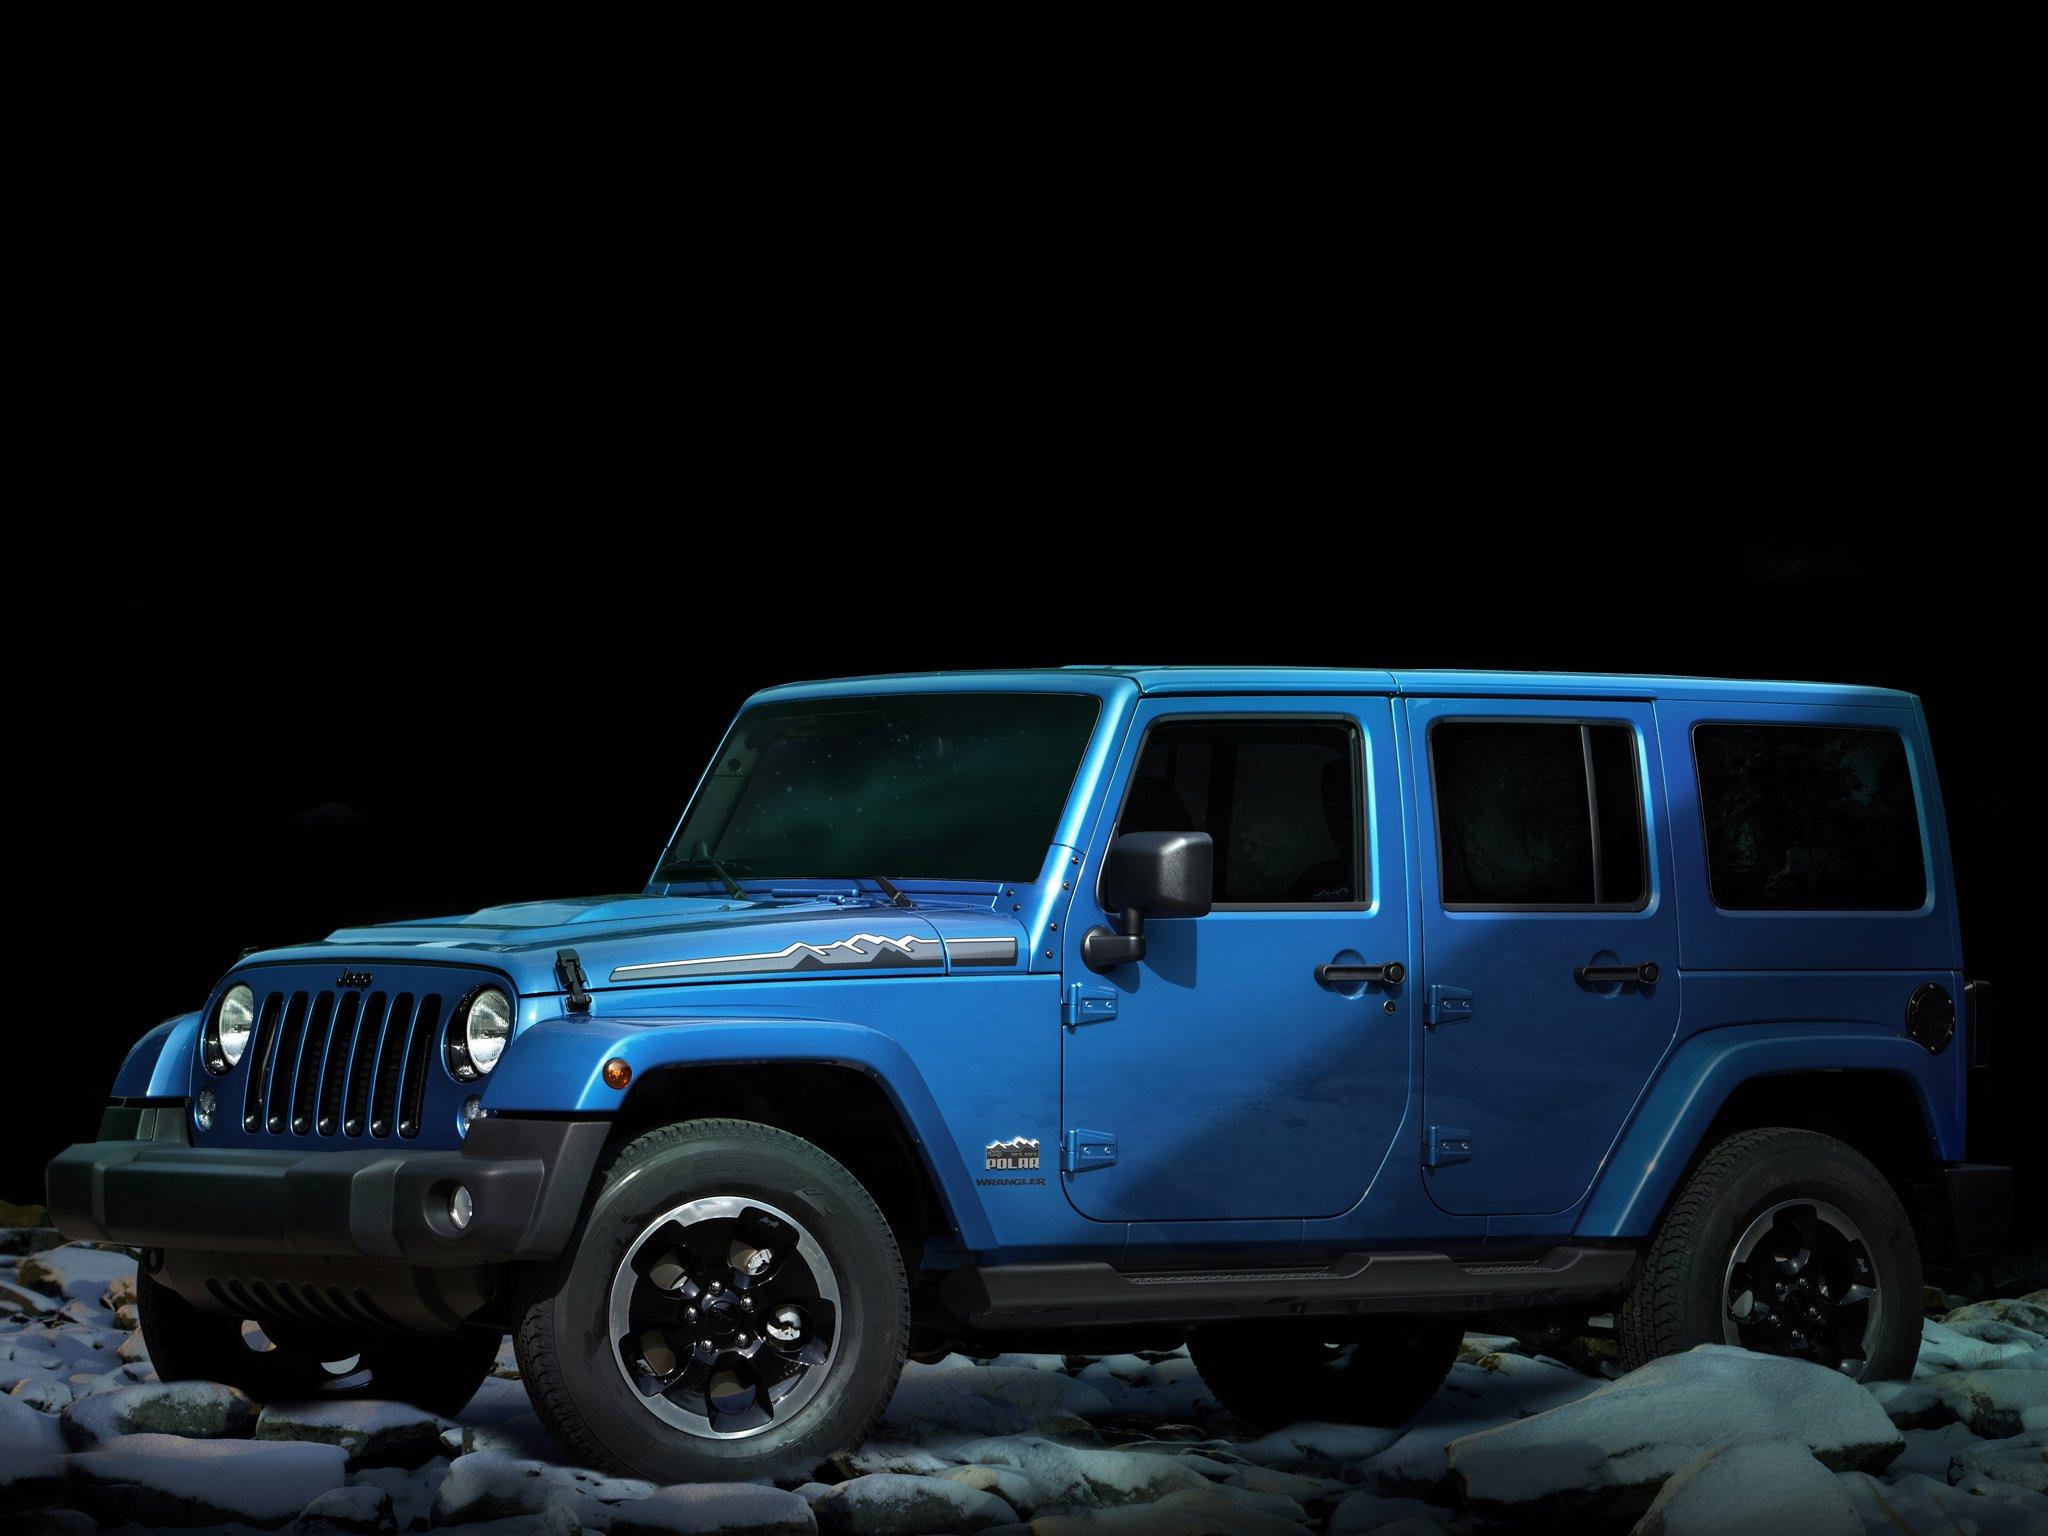 2014 jeep wrangler unlimited polar j k 4x4 h wallpaper 2048x1536 245470 wallpaperup. Black Bedroom Furniture Sets. Home Design Ideas